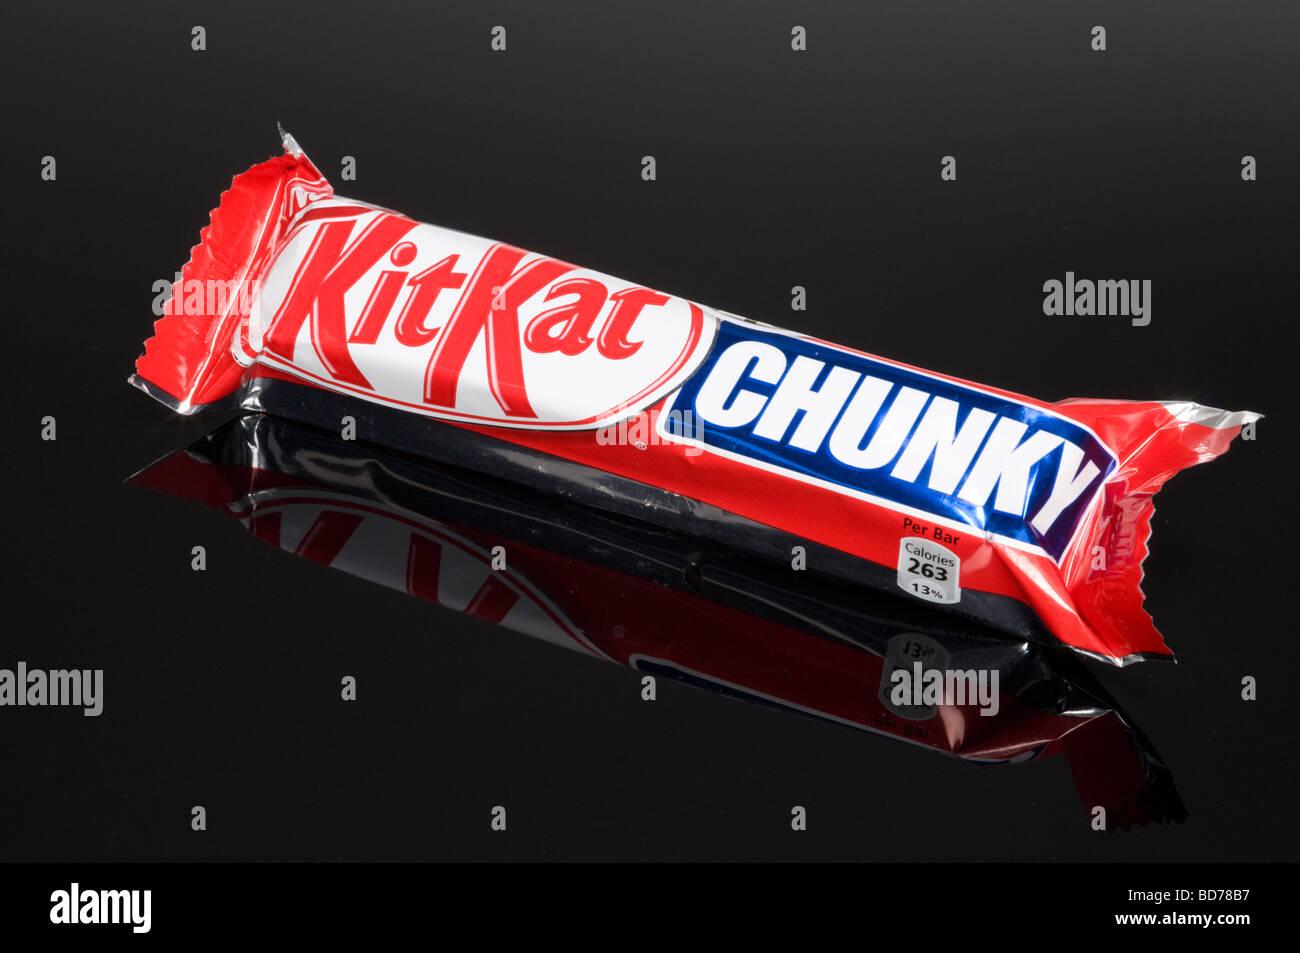 Nestle KitKat Chunky Chocolate Bar On Black Background Shot In Studio - Stock Image